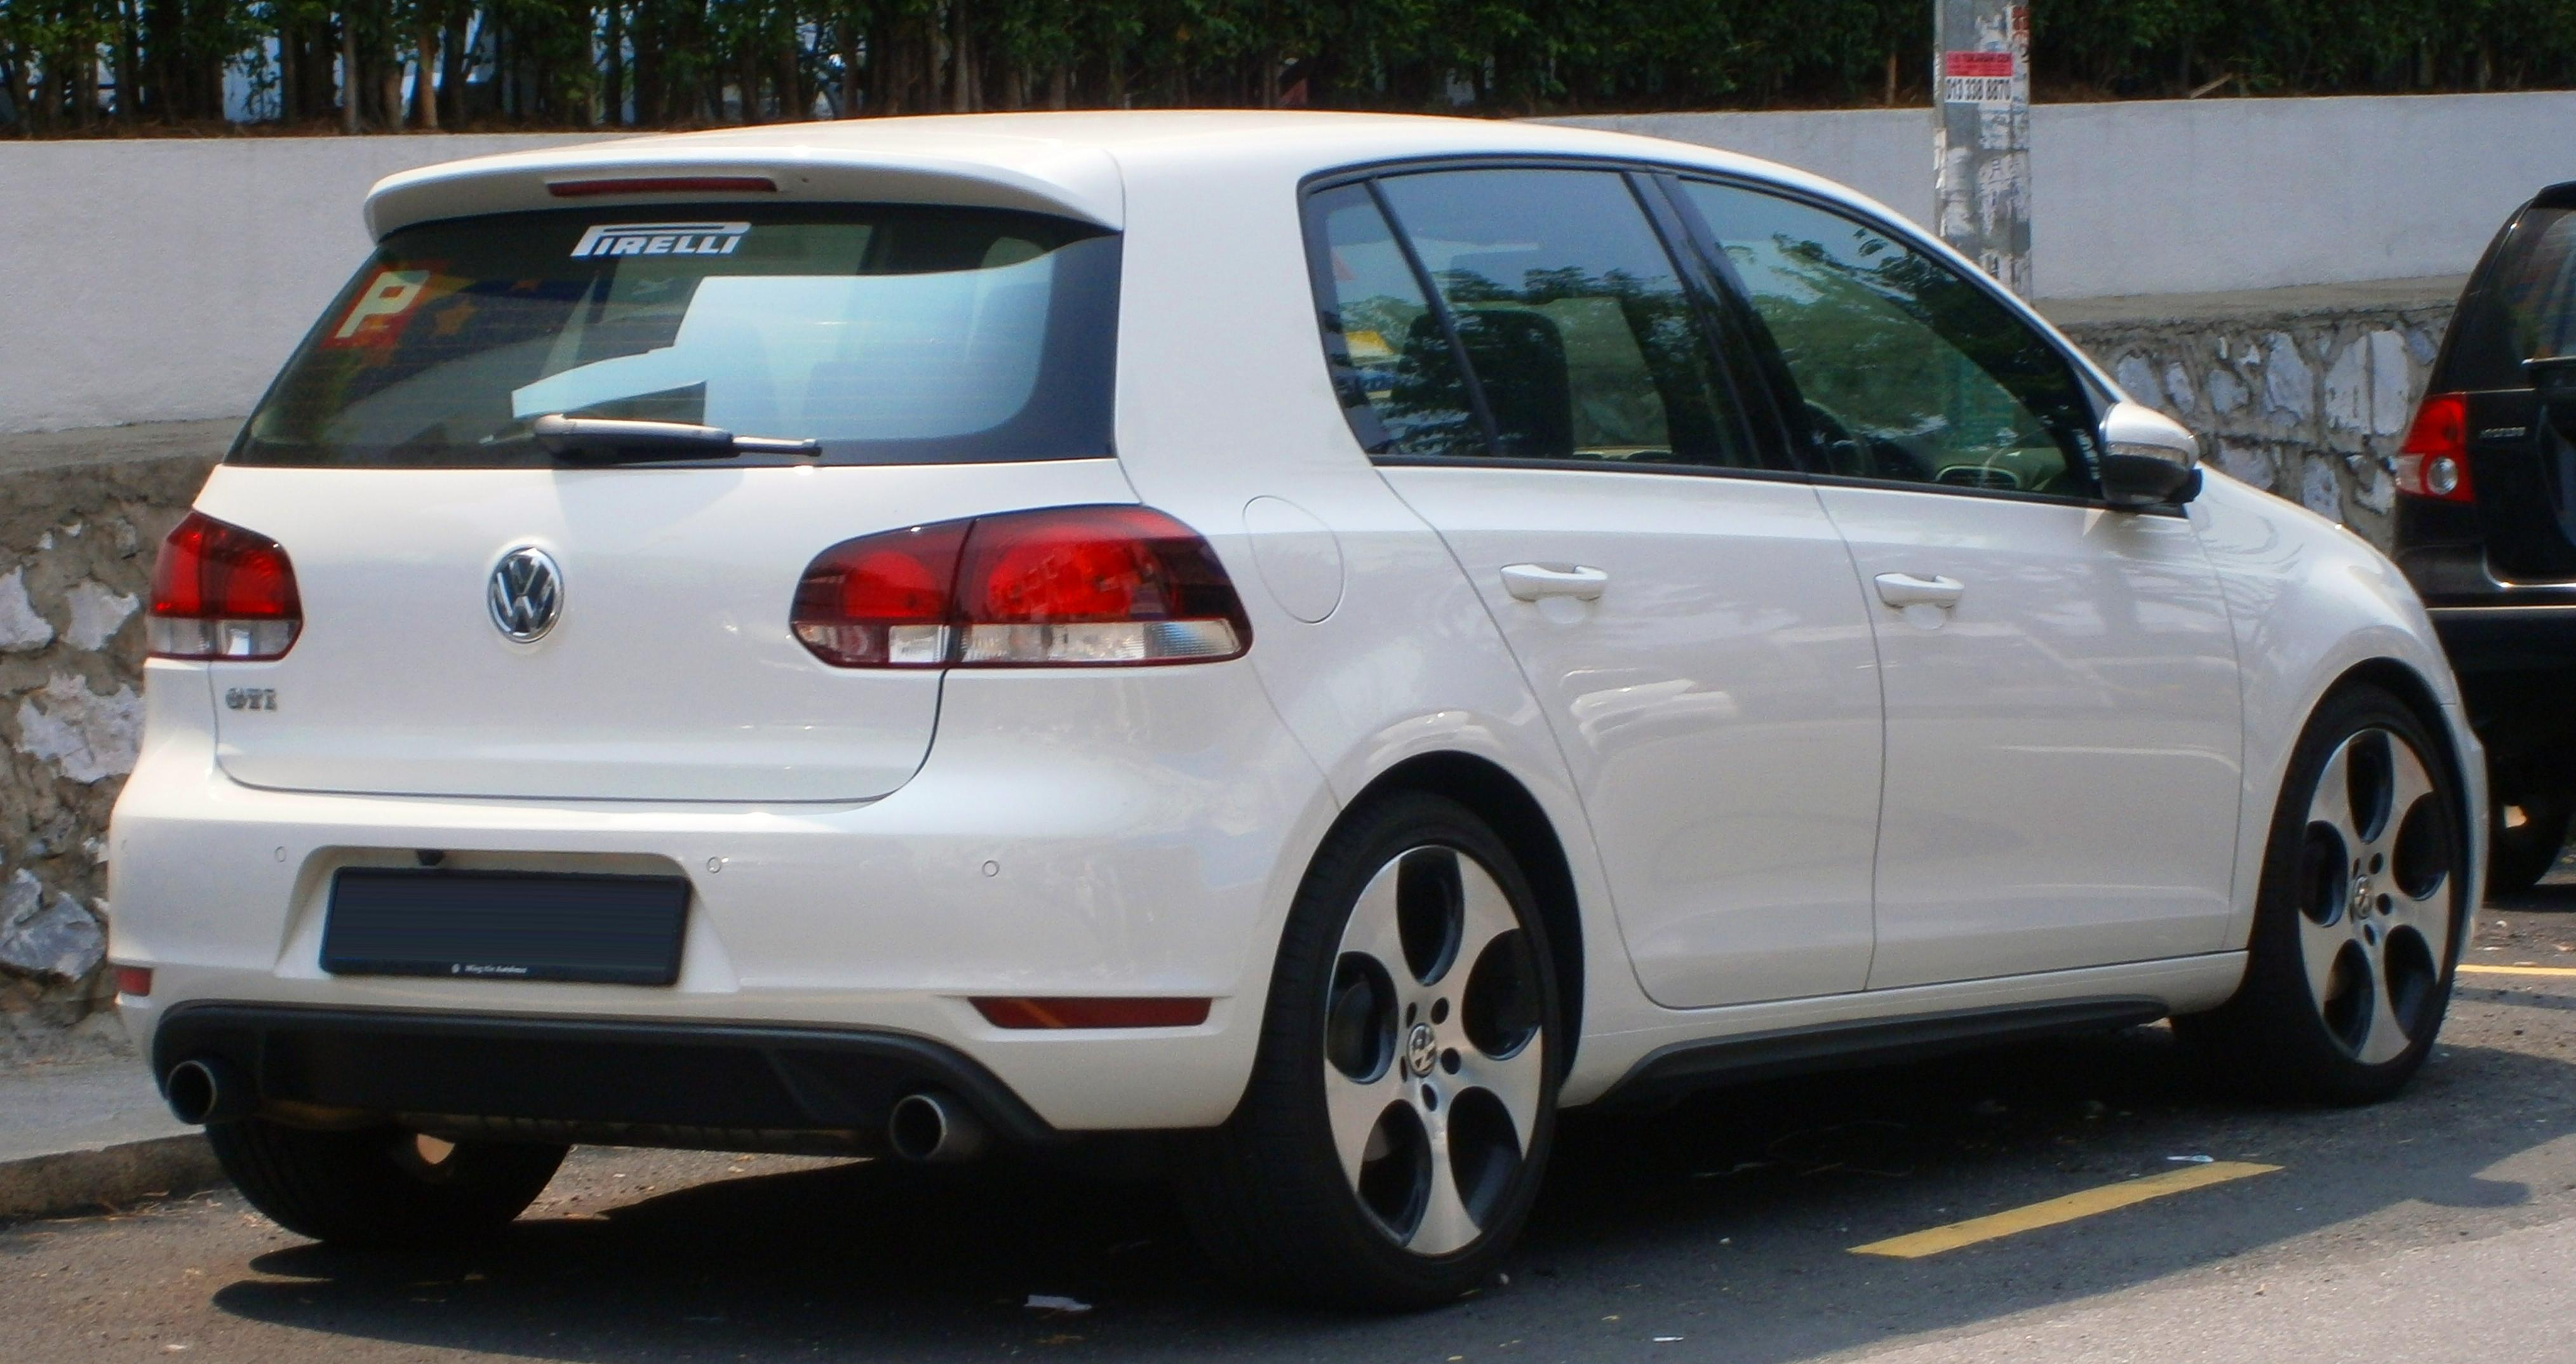 File:2012 Volkswagen Golf GTi in Subang Jaya, Malaysia (02).jpg - Wikimedia Commons